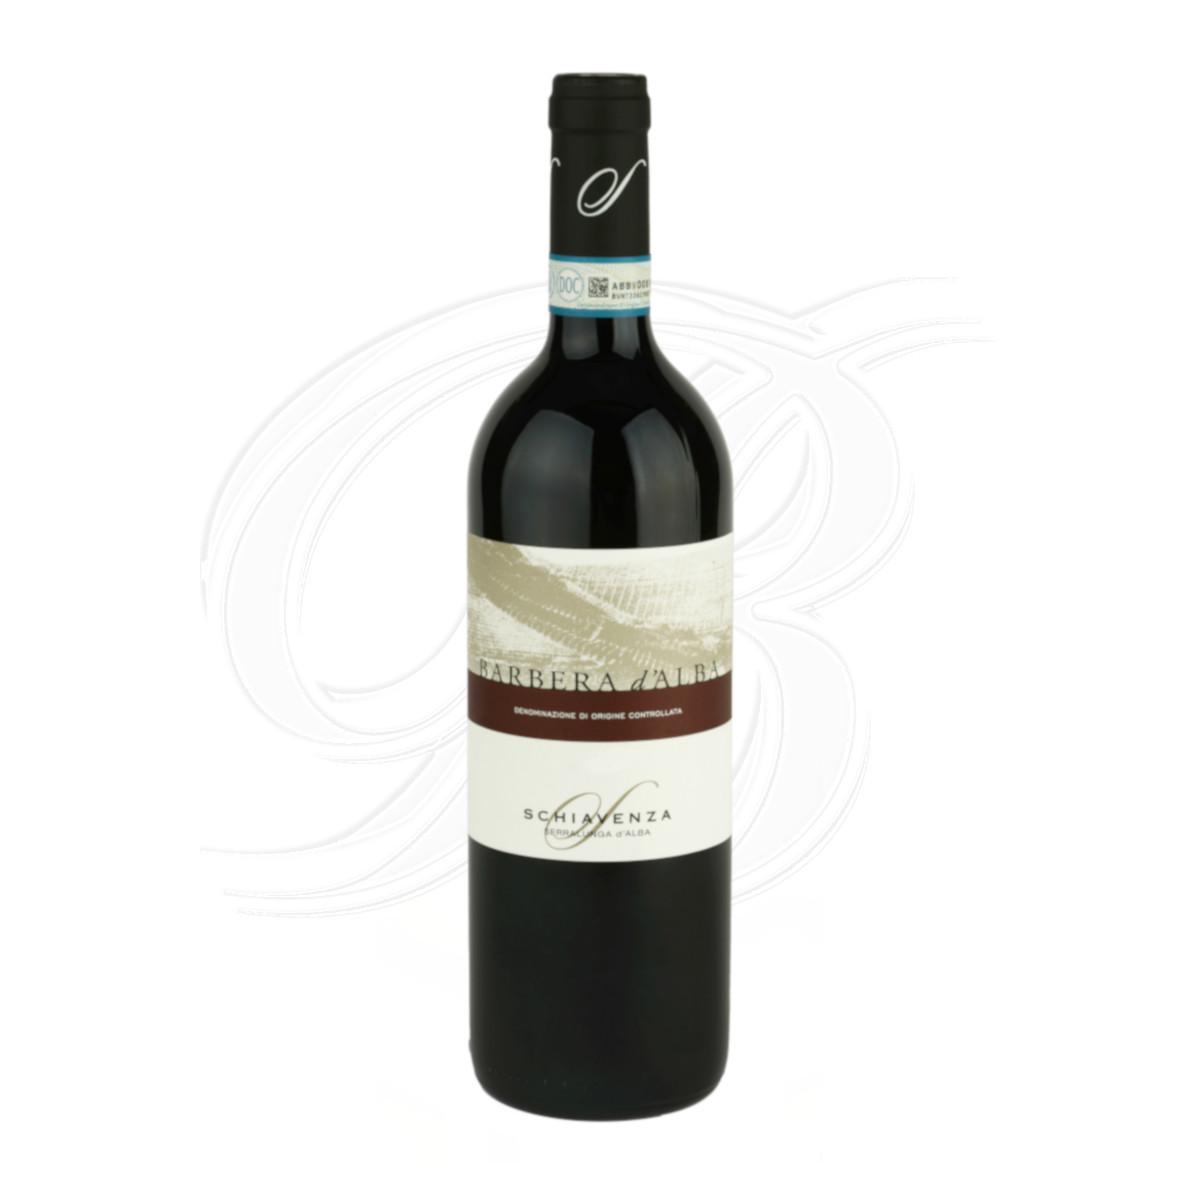 Barbera d'Alba vom Weingut Schiavenza in Serralunga d'Alba im Piemont